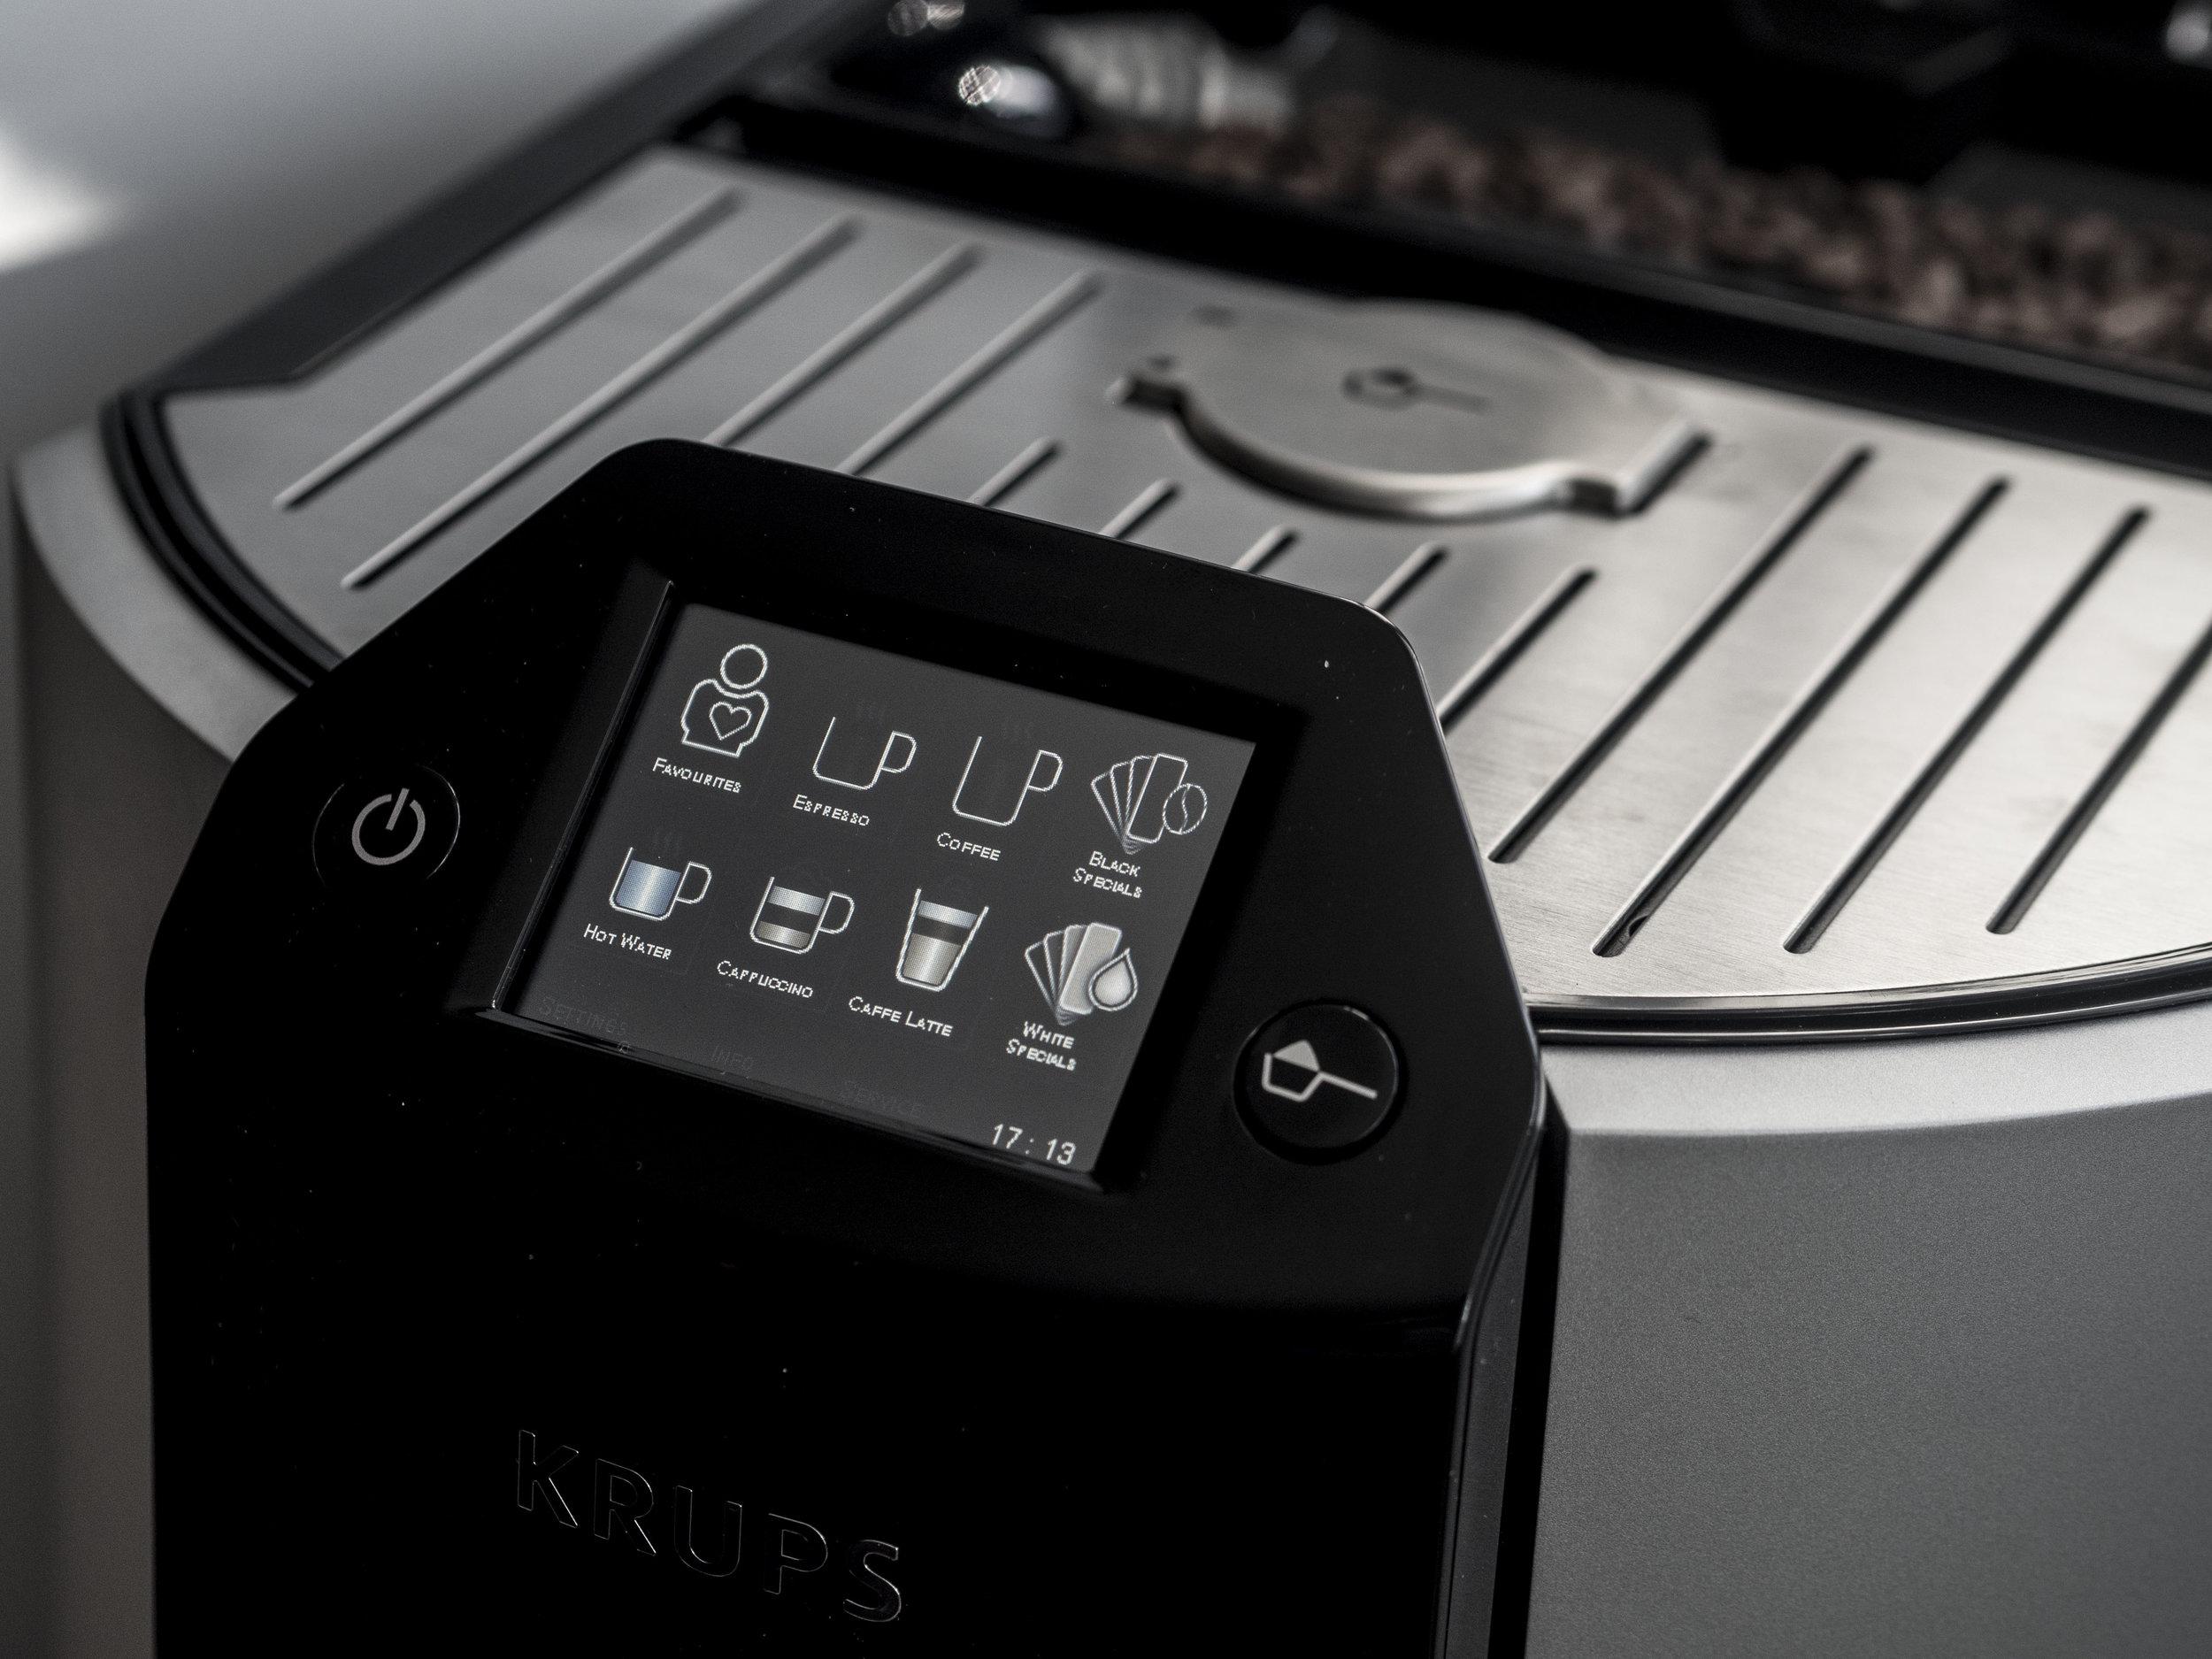 KRUPS EA9000 Series Coffee Machine